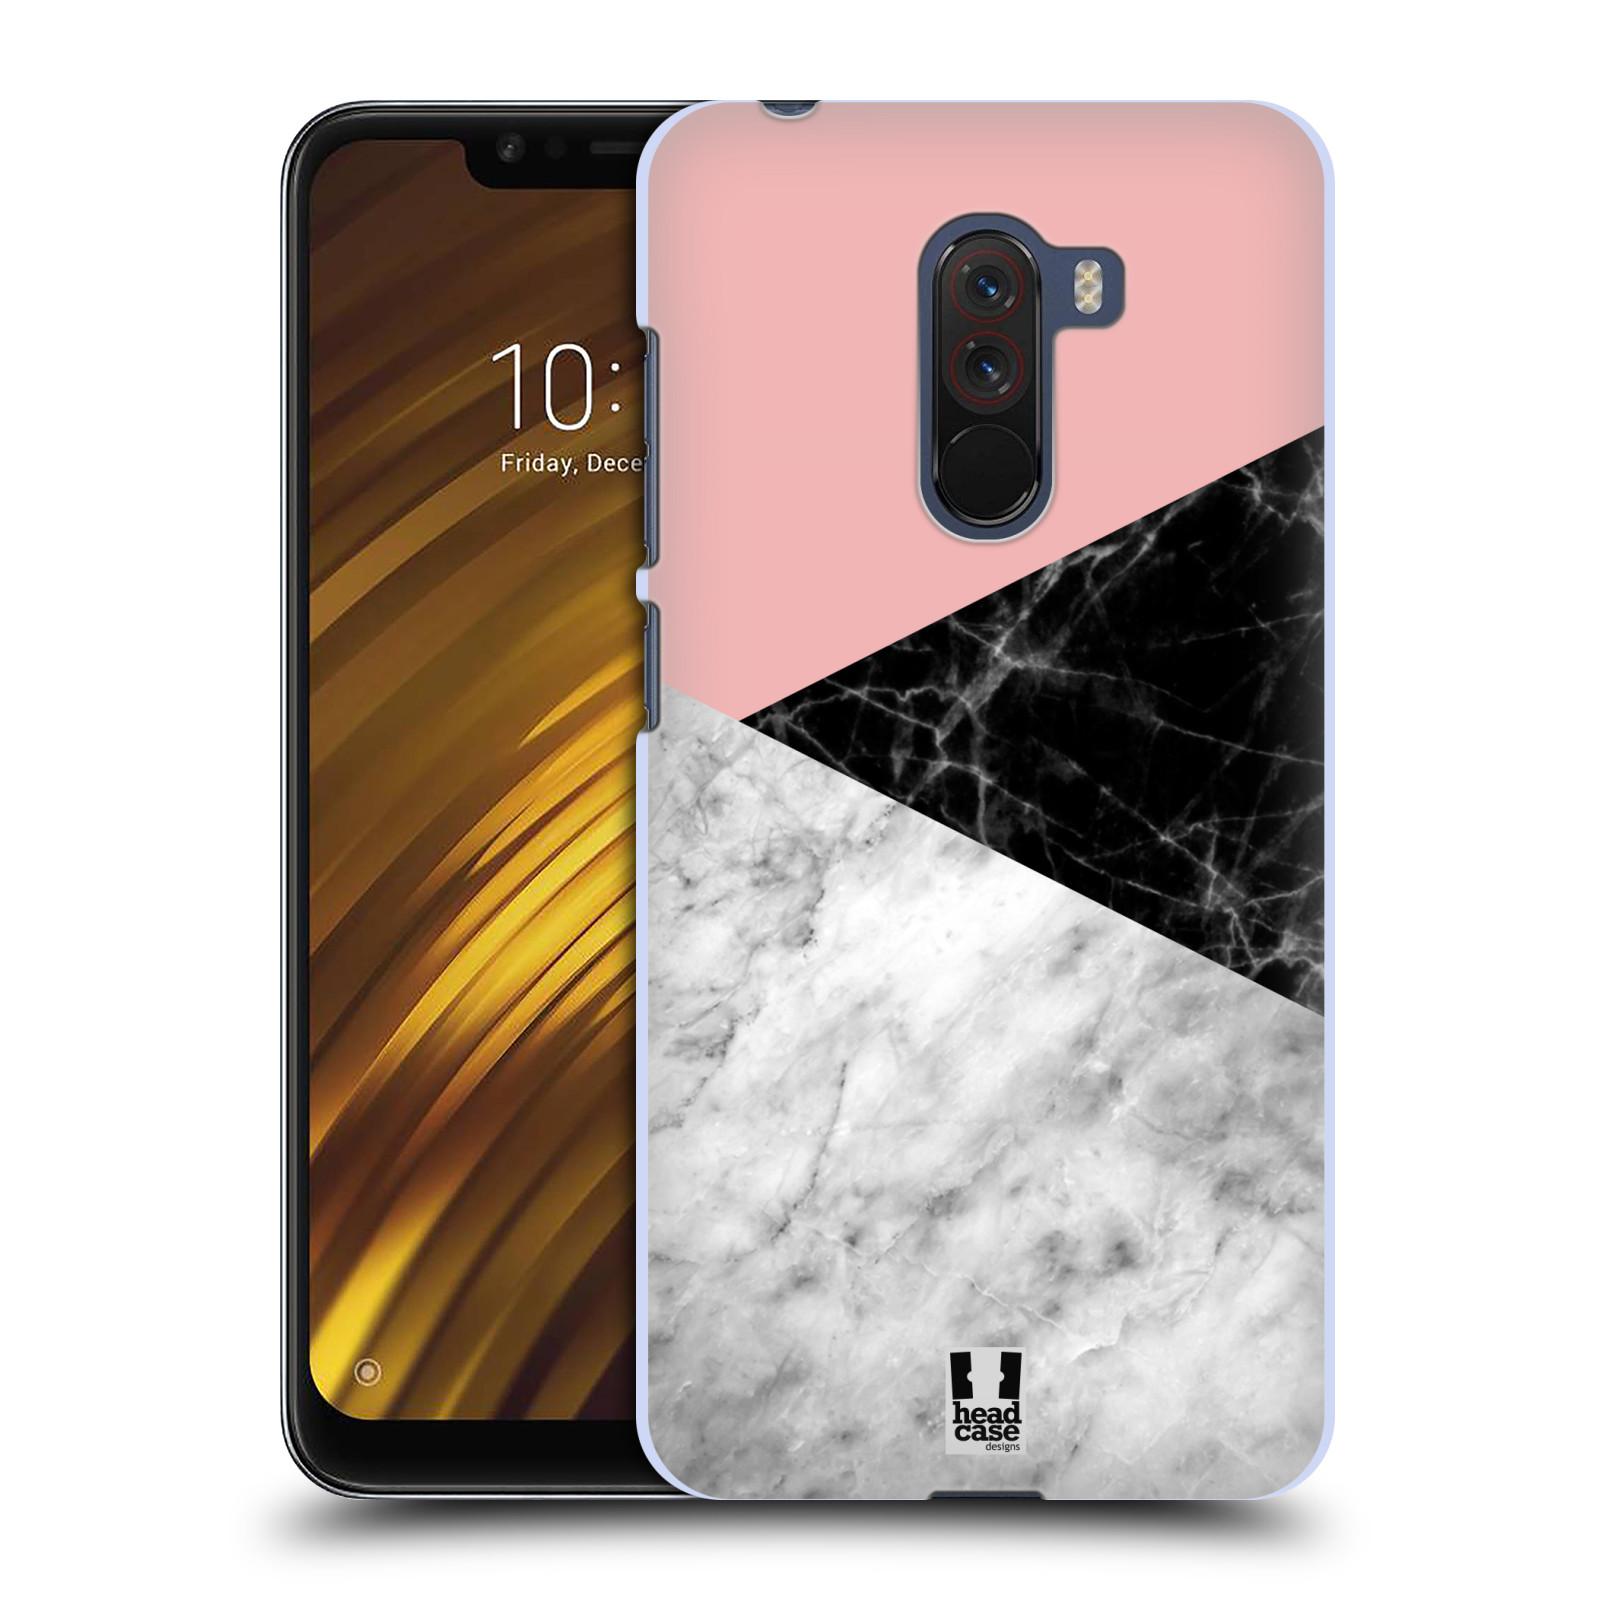 Plastové pouzdro na mobil Xiaomi Pocophone F1 - Head Case - Mramor mix